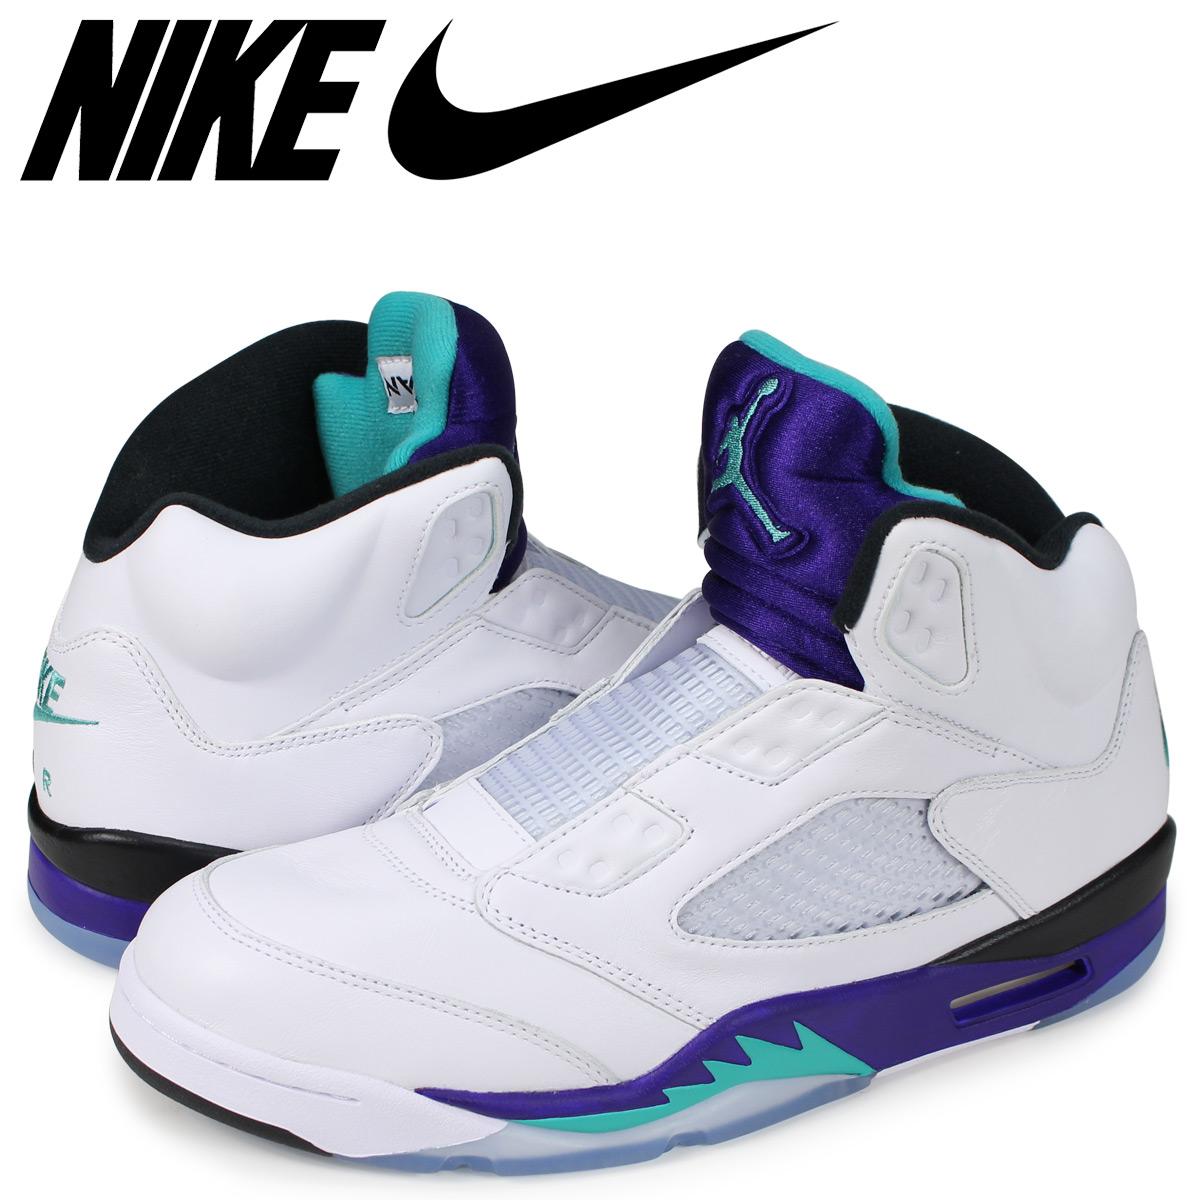 hot sale online 04e92 88b8b  brand NIKE getting high popularity from sneakers freak .